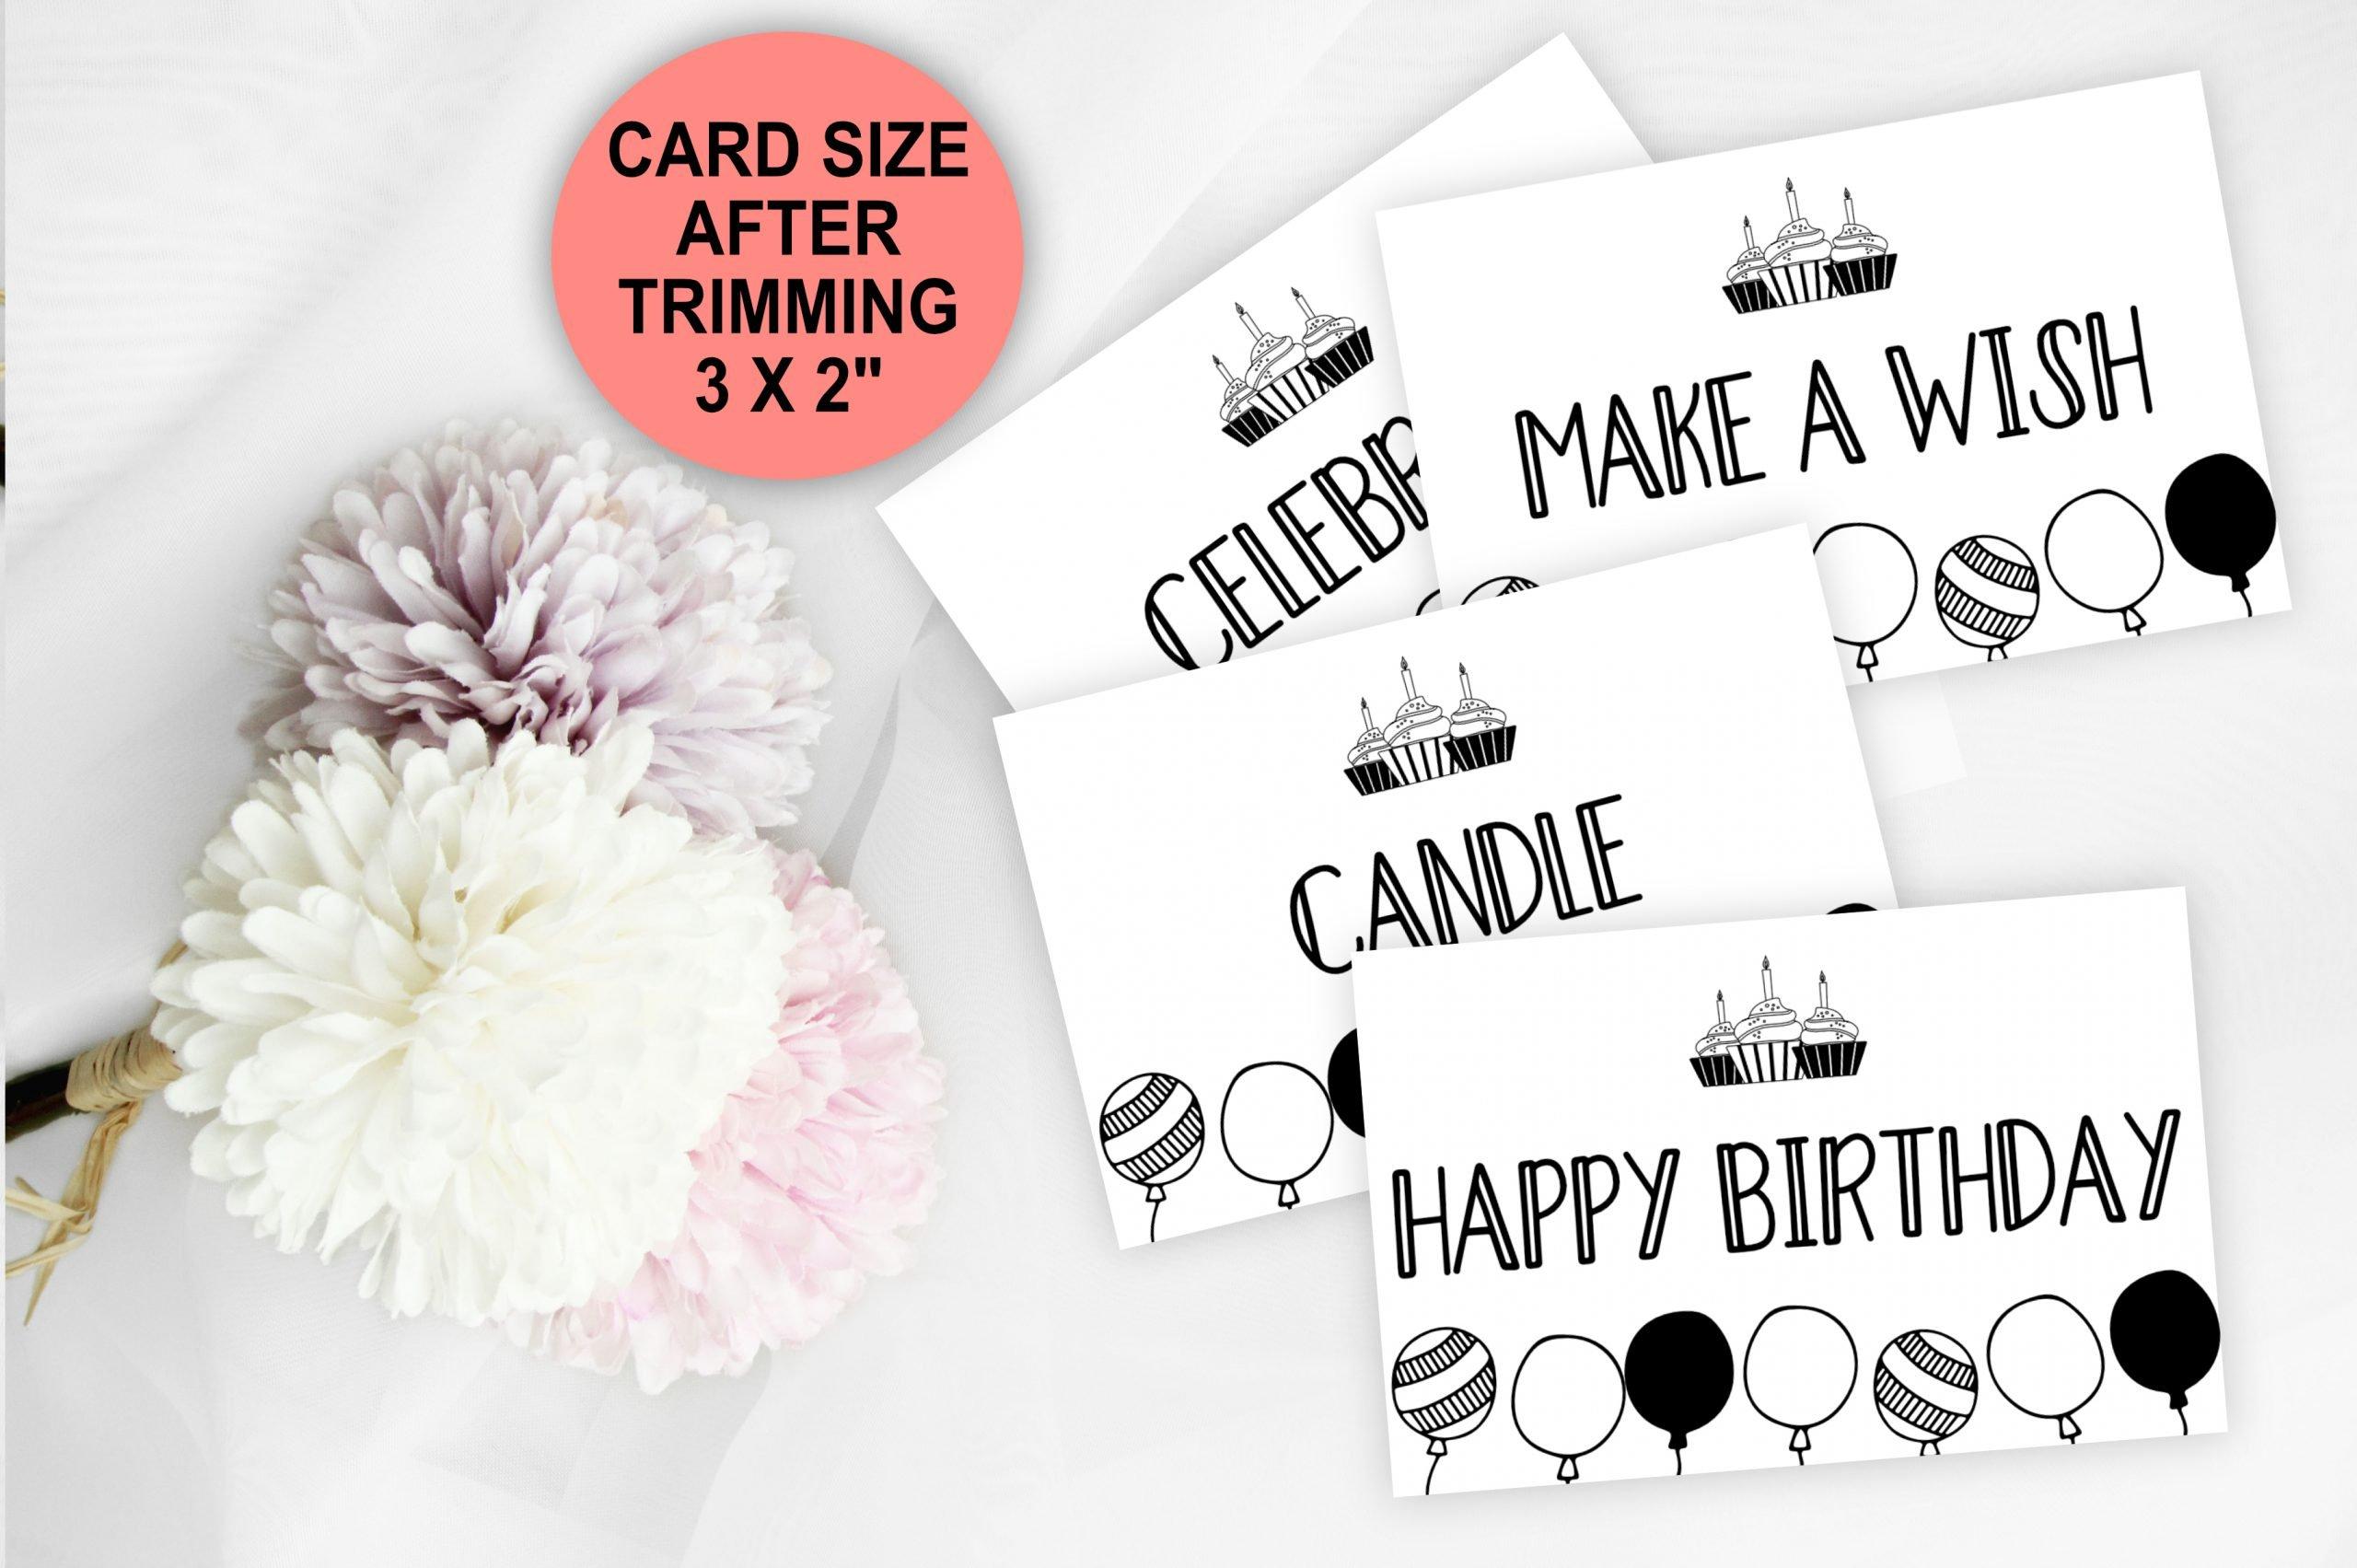 BIRTHDAY GAMES 100 Birthday Party Charades Game Cards bIRTHDAY